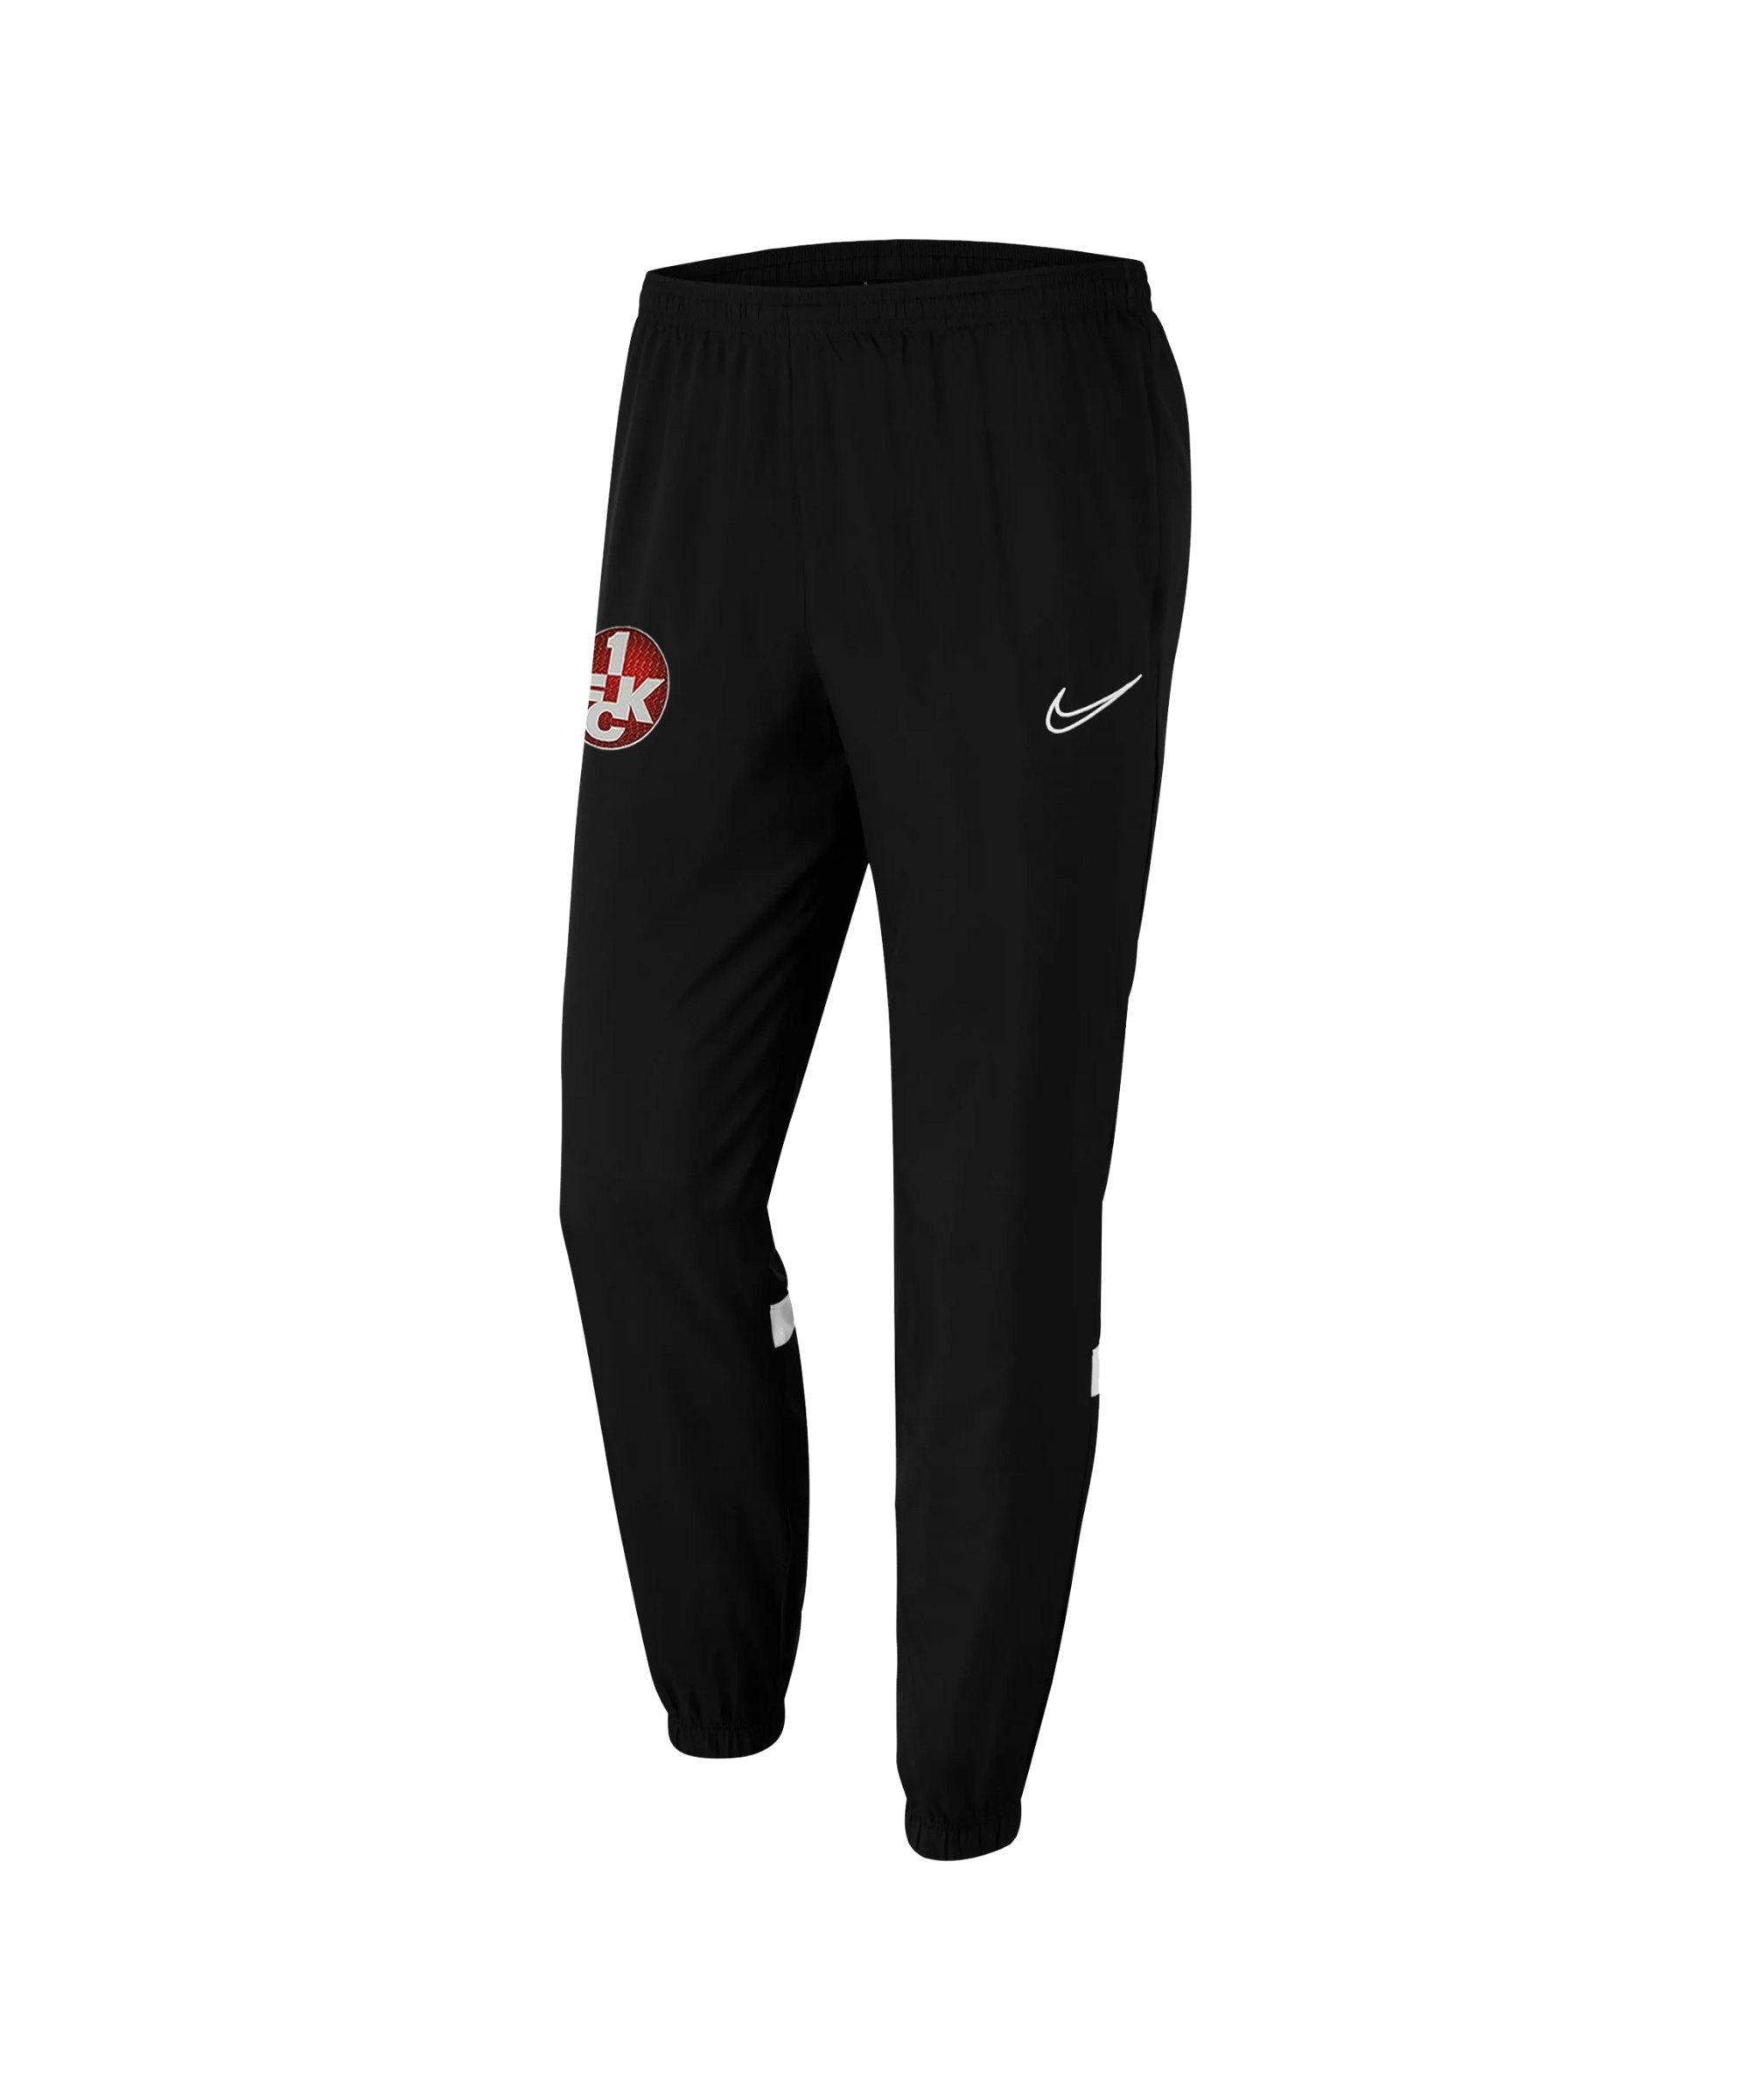 Nike 1. FC Kaiserslautern Trainingshose Woven F010 - schwarz